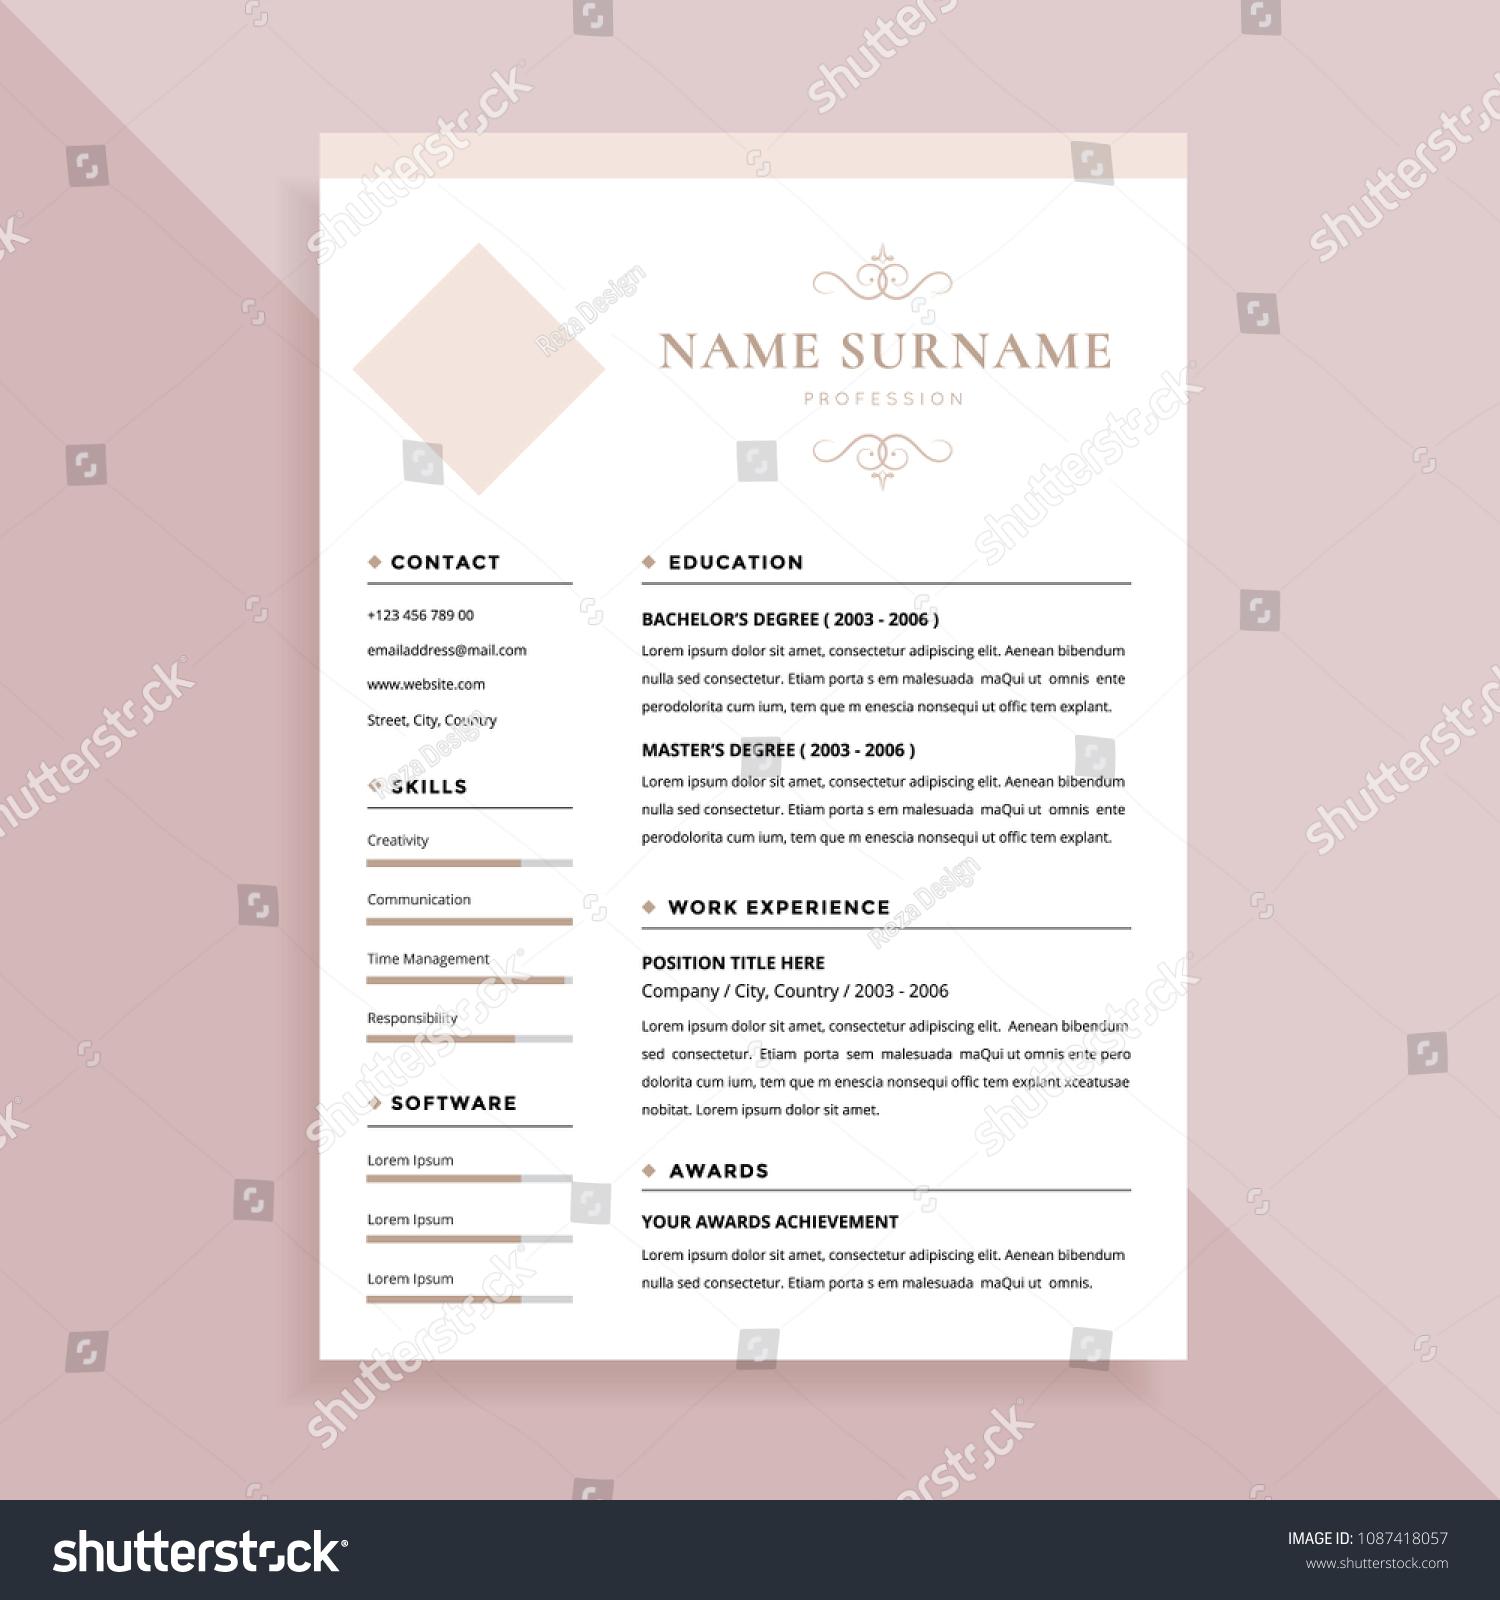 Elegant Simple Resume Template Design Stock Vector (Royalty Free